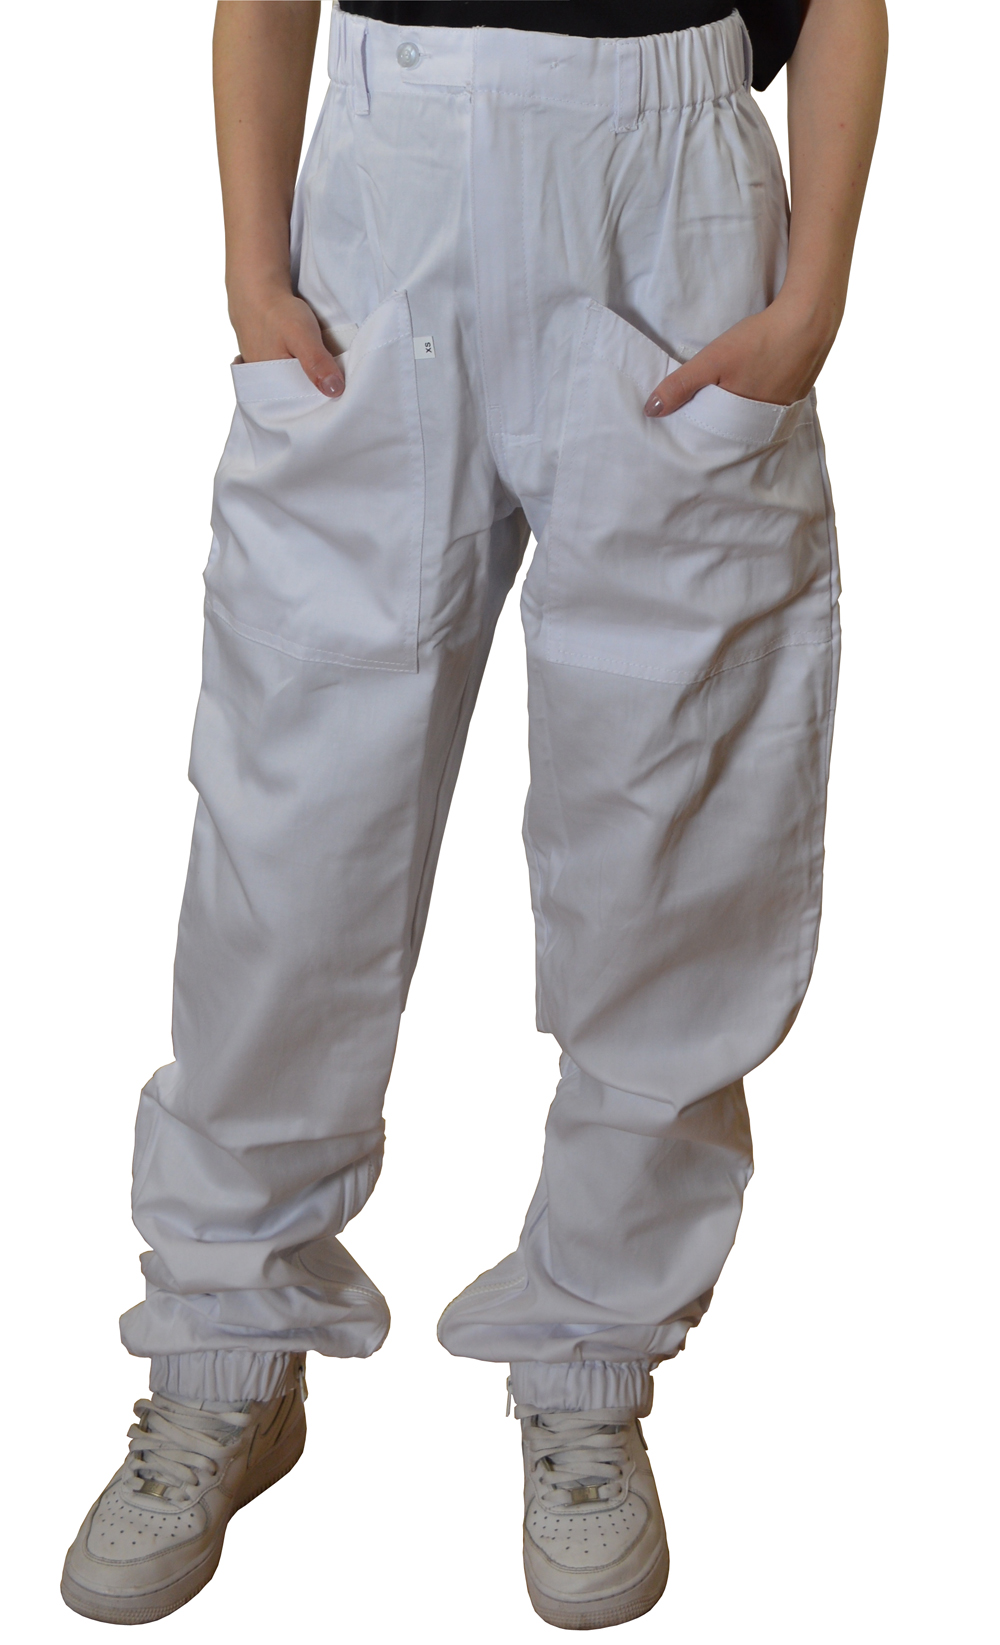 Pantalon seyant